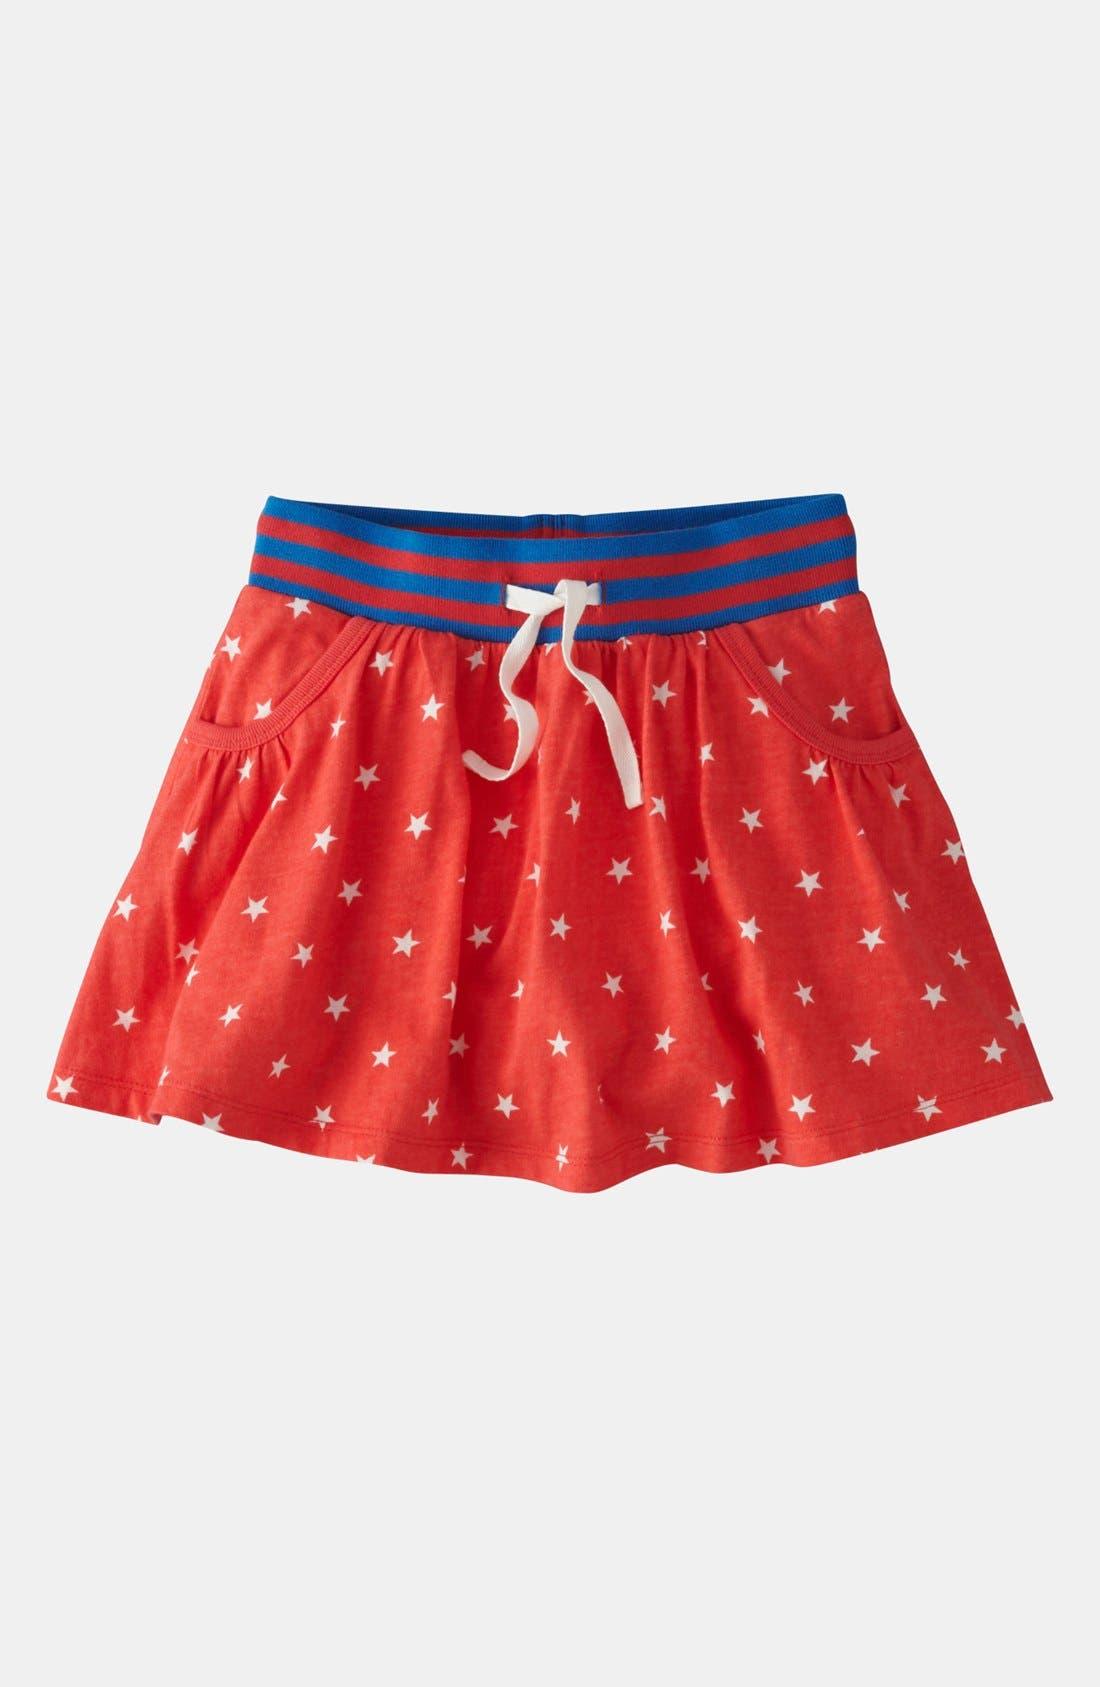 Alternate Image 1 Selected - Mini Boden Jersey Skort (Toddler)